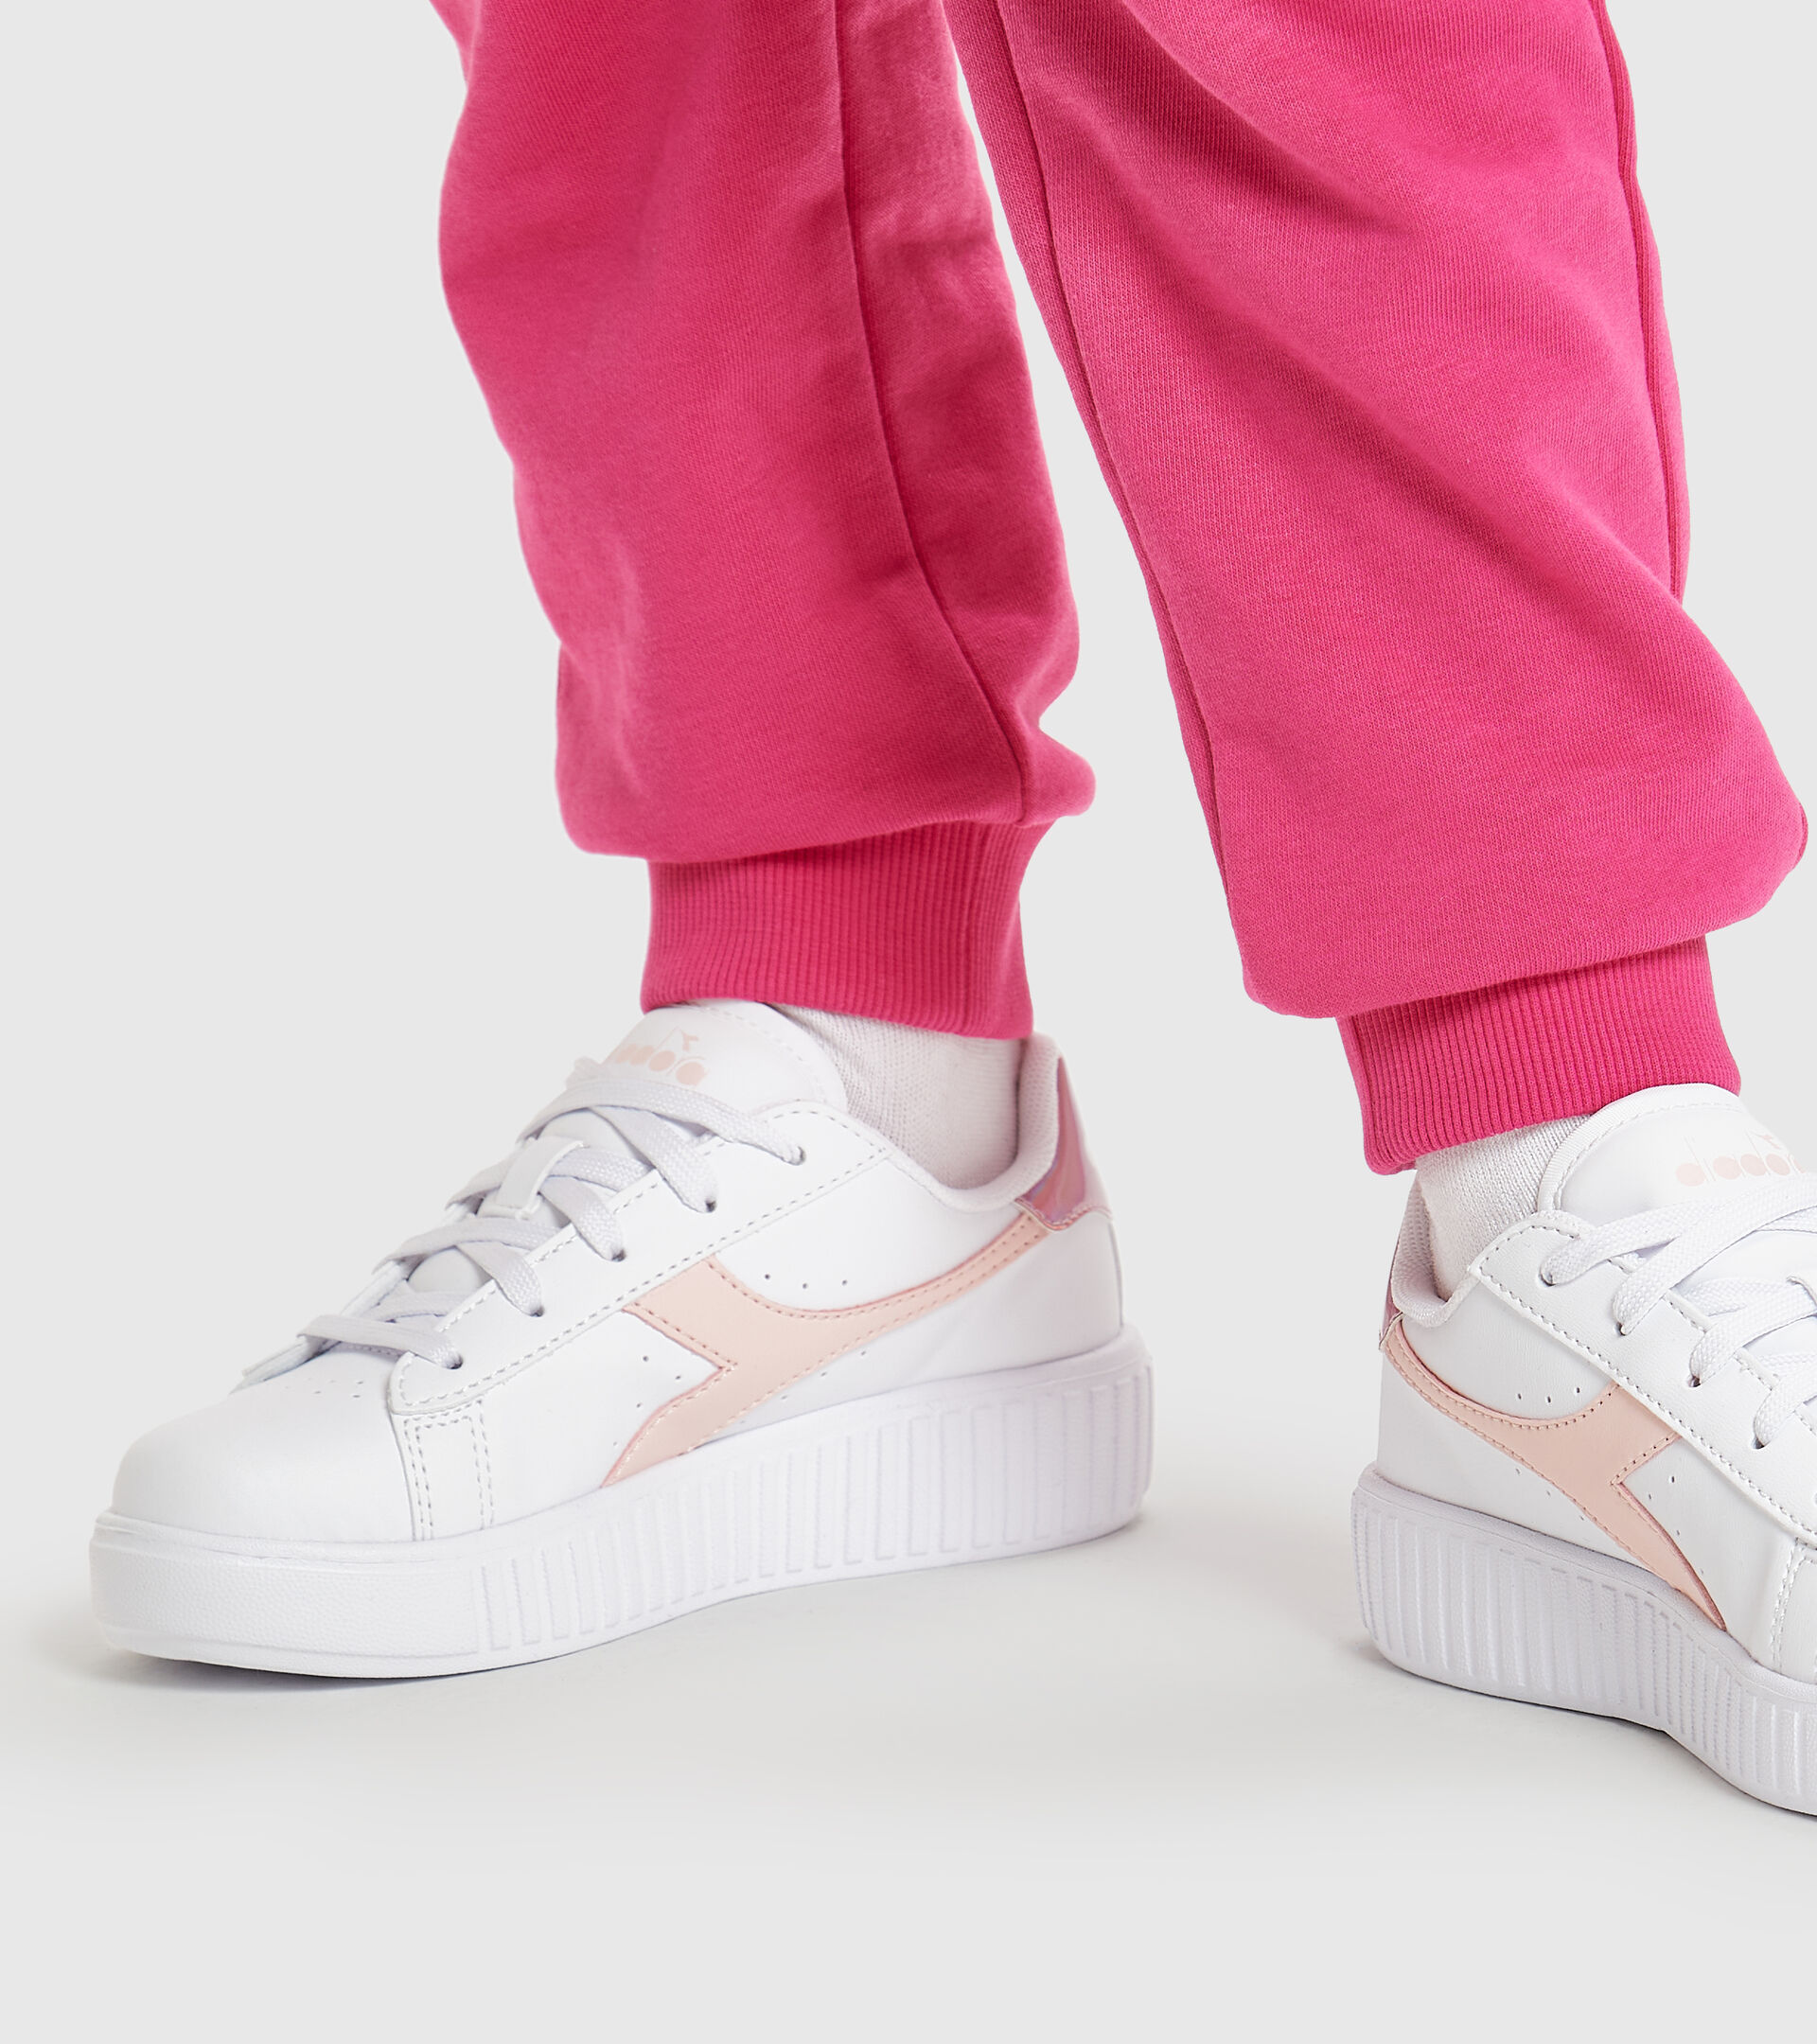 Footwear Sport BAMBINO GAME STEP PS BLANCO/ROSA VELADO Diadora